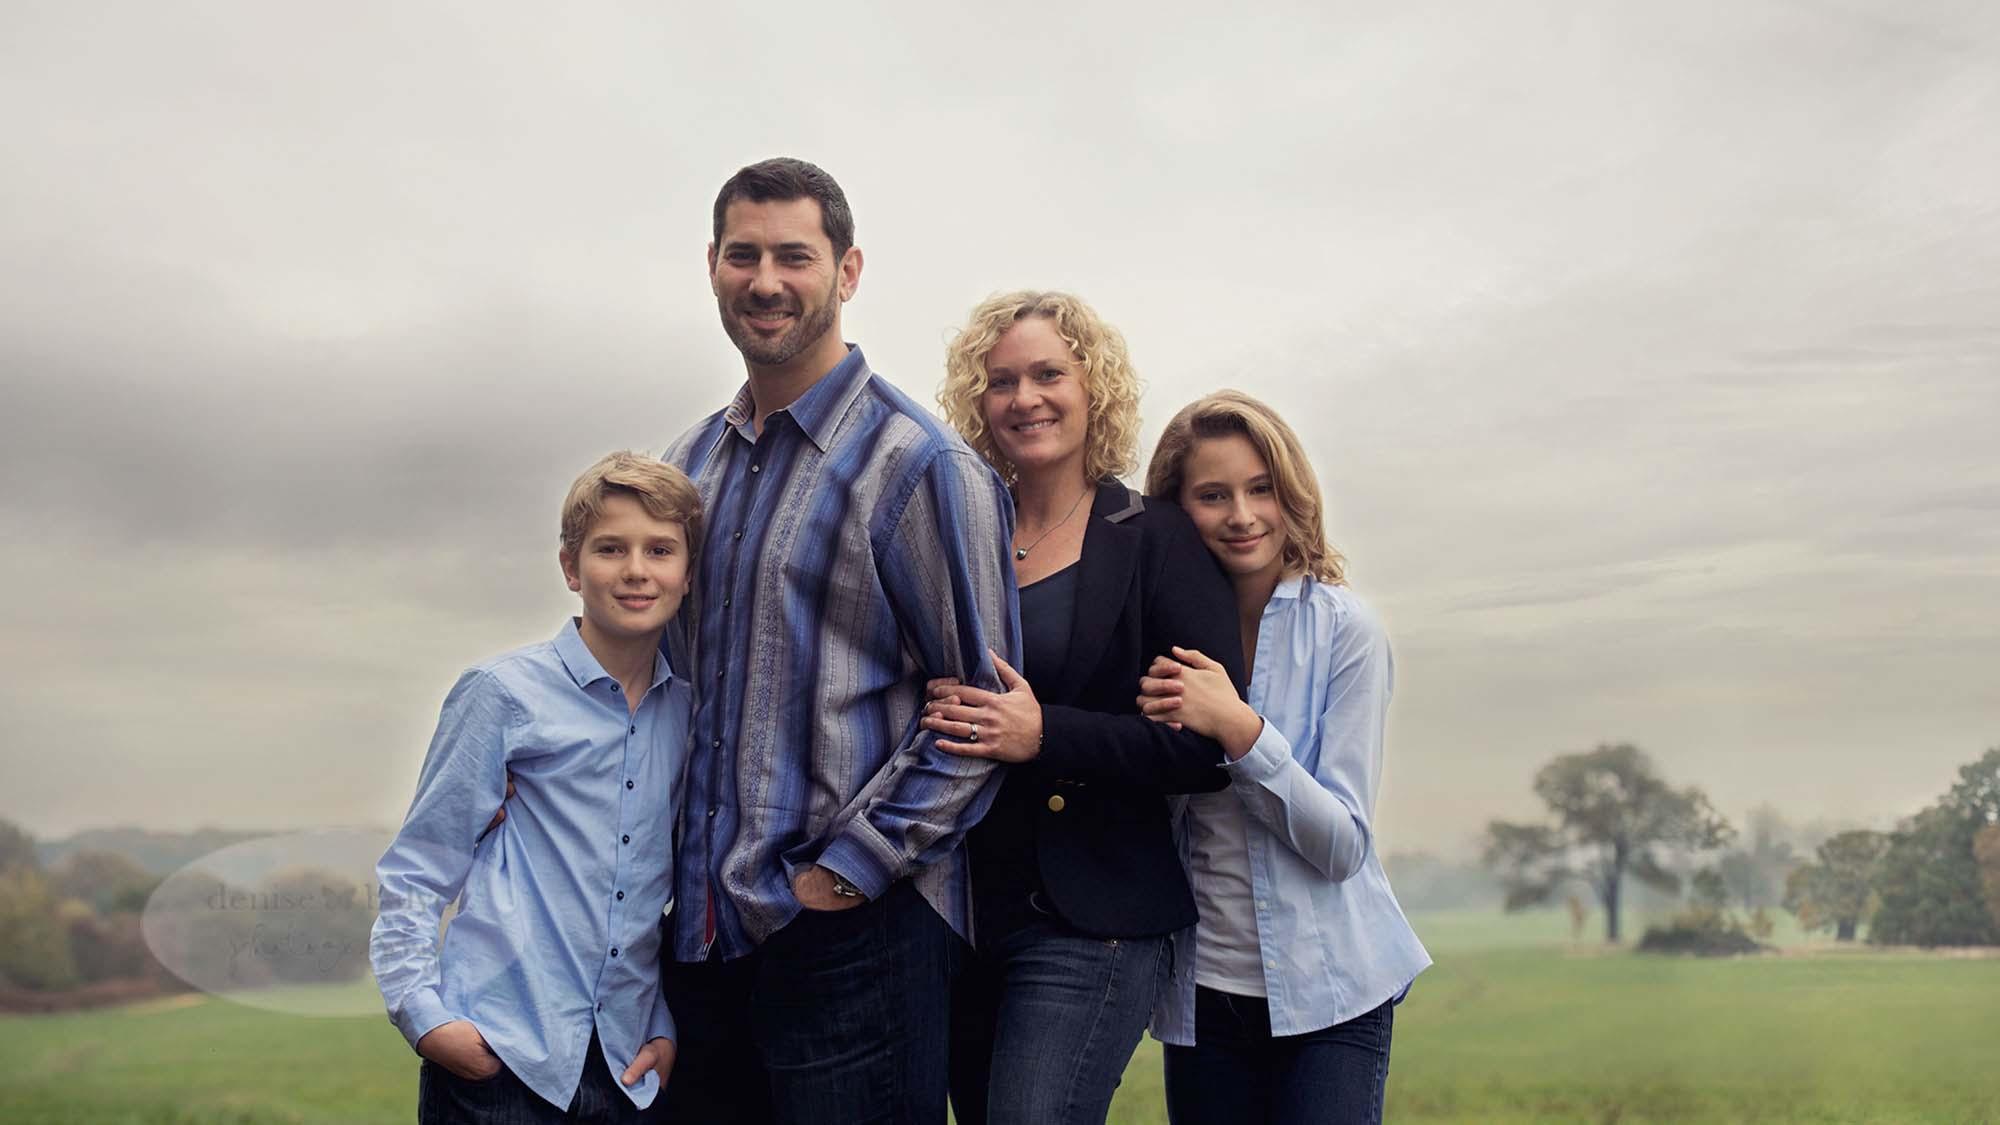 family-photographer-virginia-water.jpg